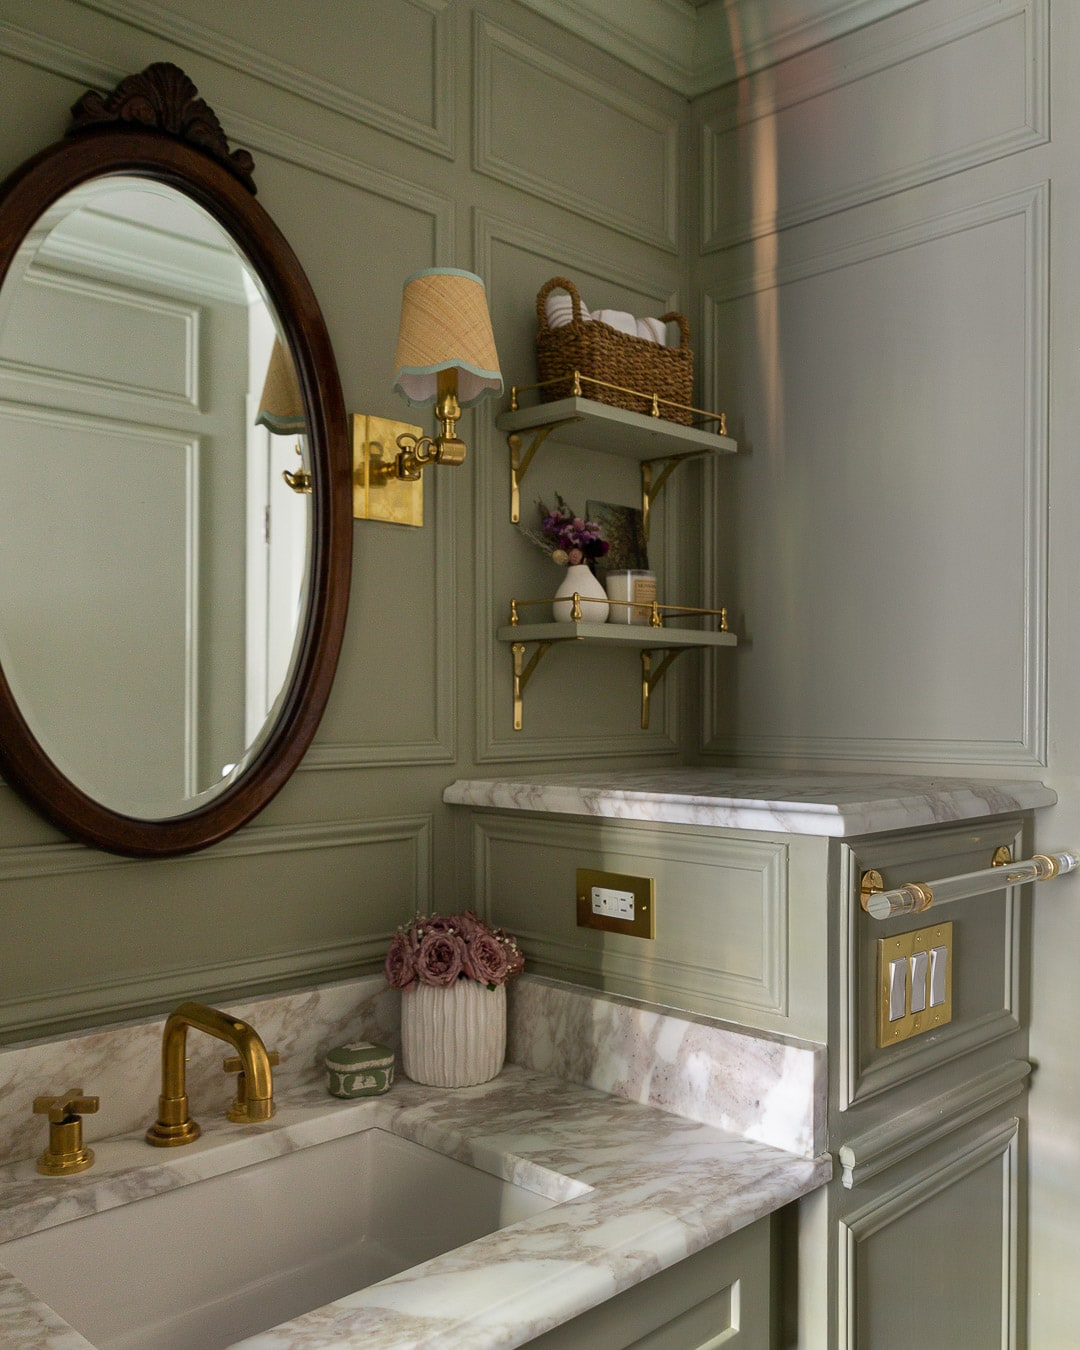 open-brass-gallery-rail-shelves